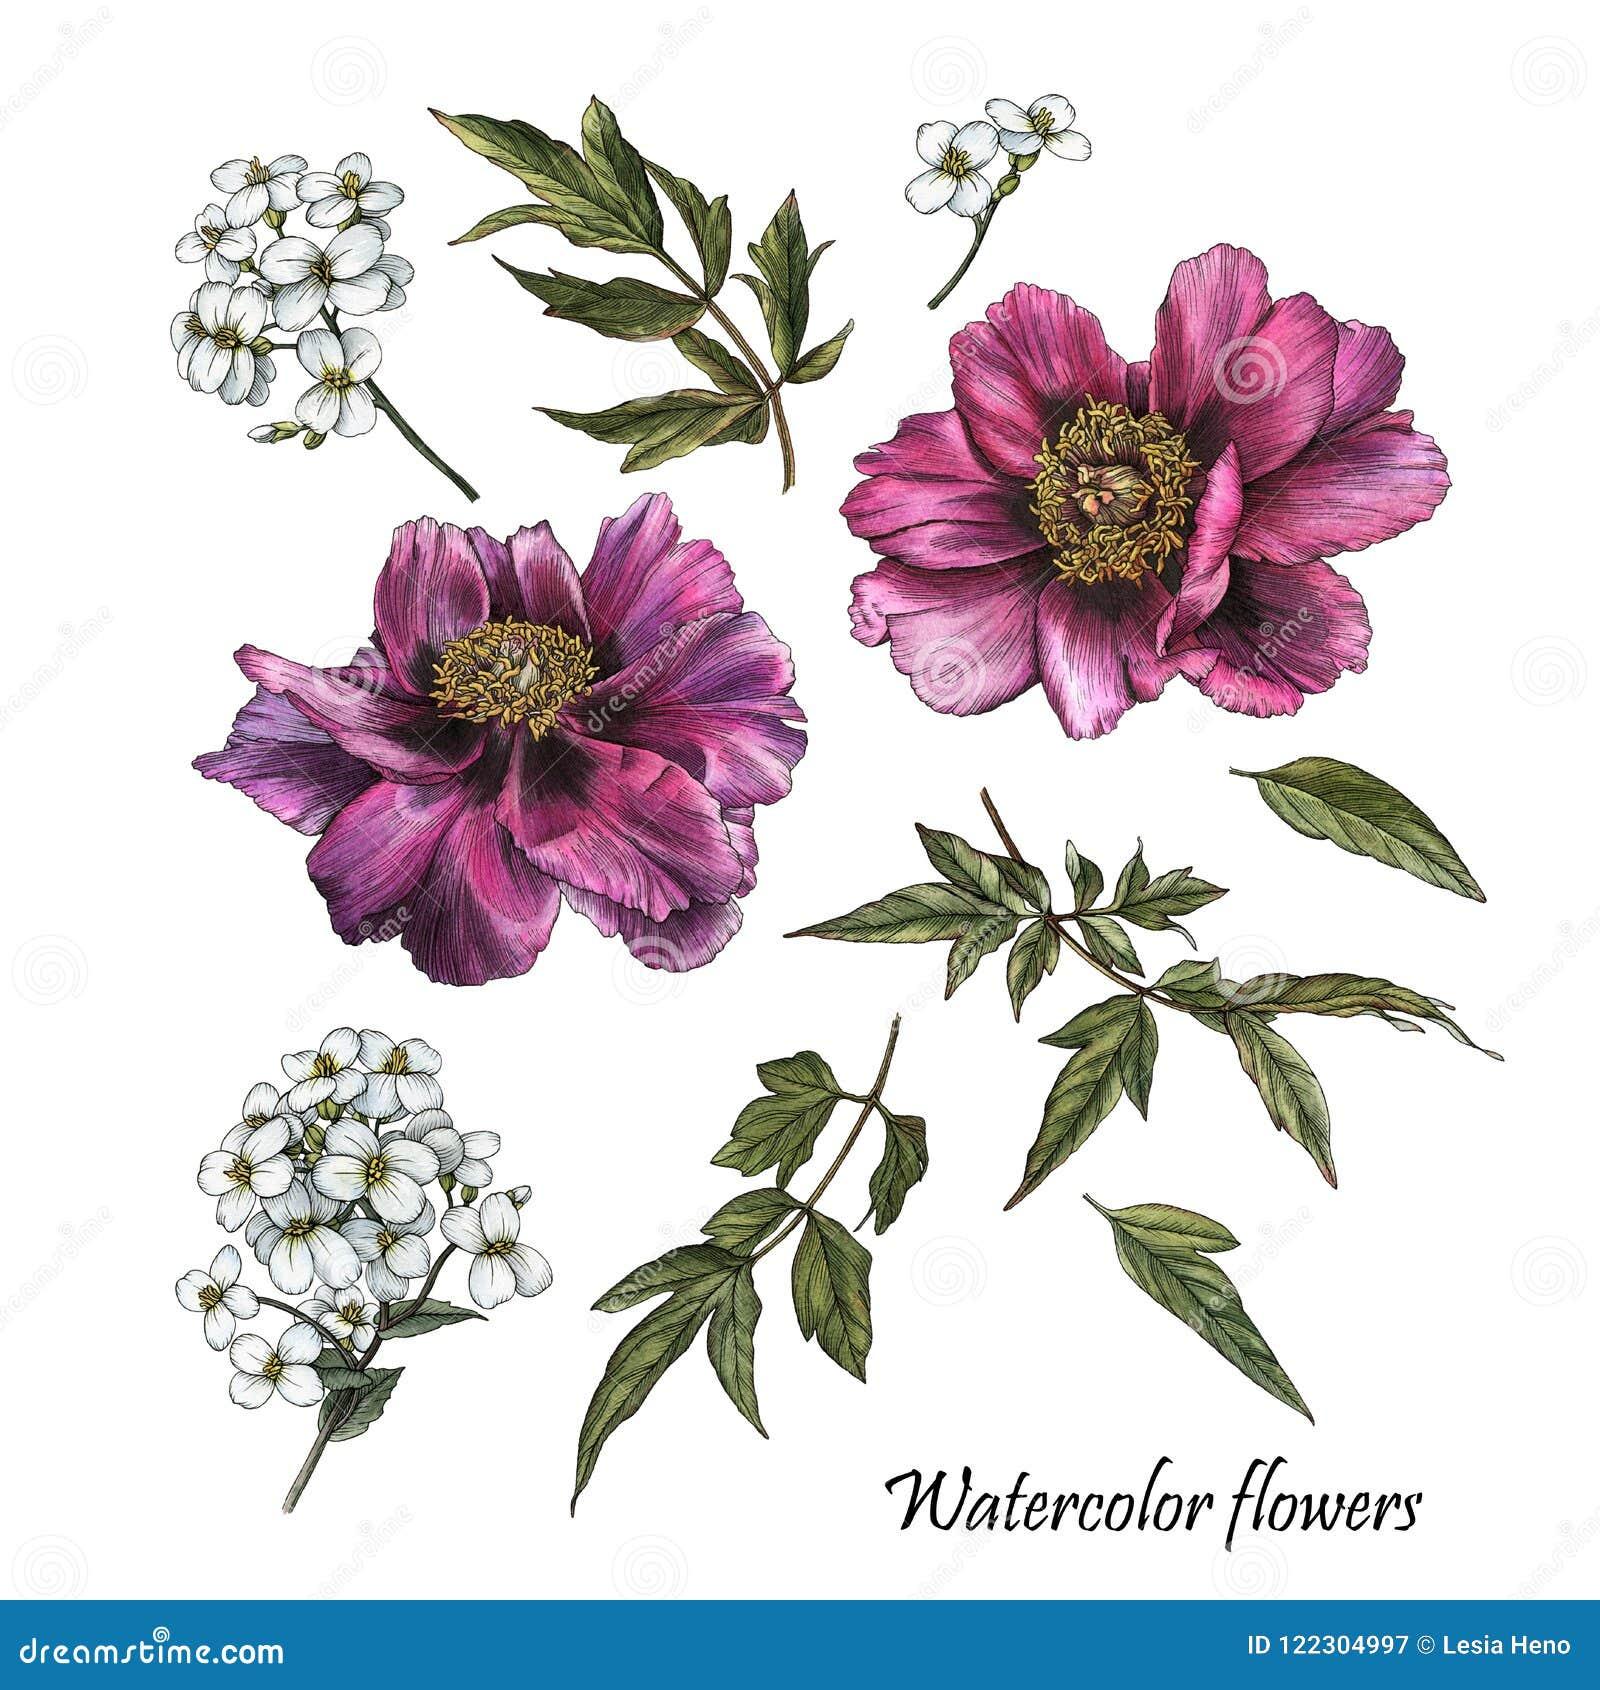 Flowers set of watercolor purple peonies and white jasmine stock flowers set of watercolor purple peonies and white jasmine izmirmasajfo